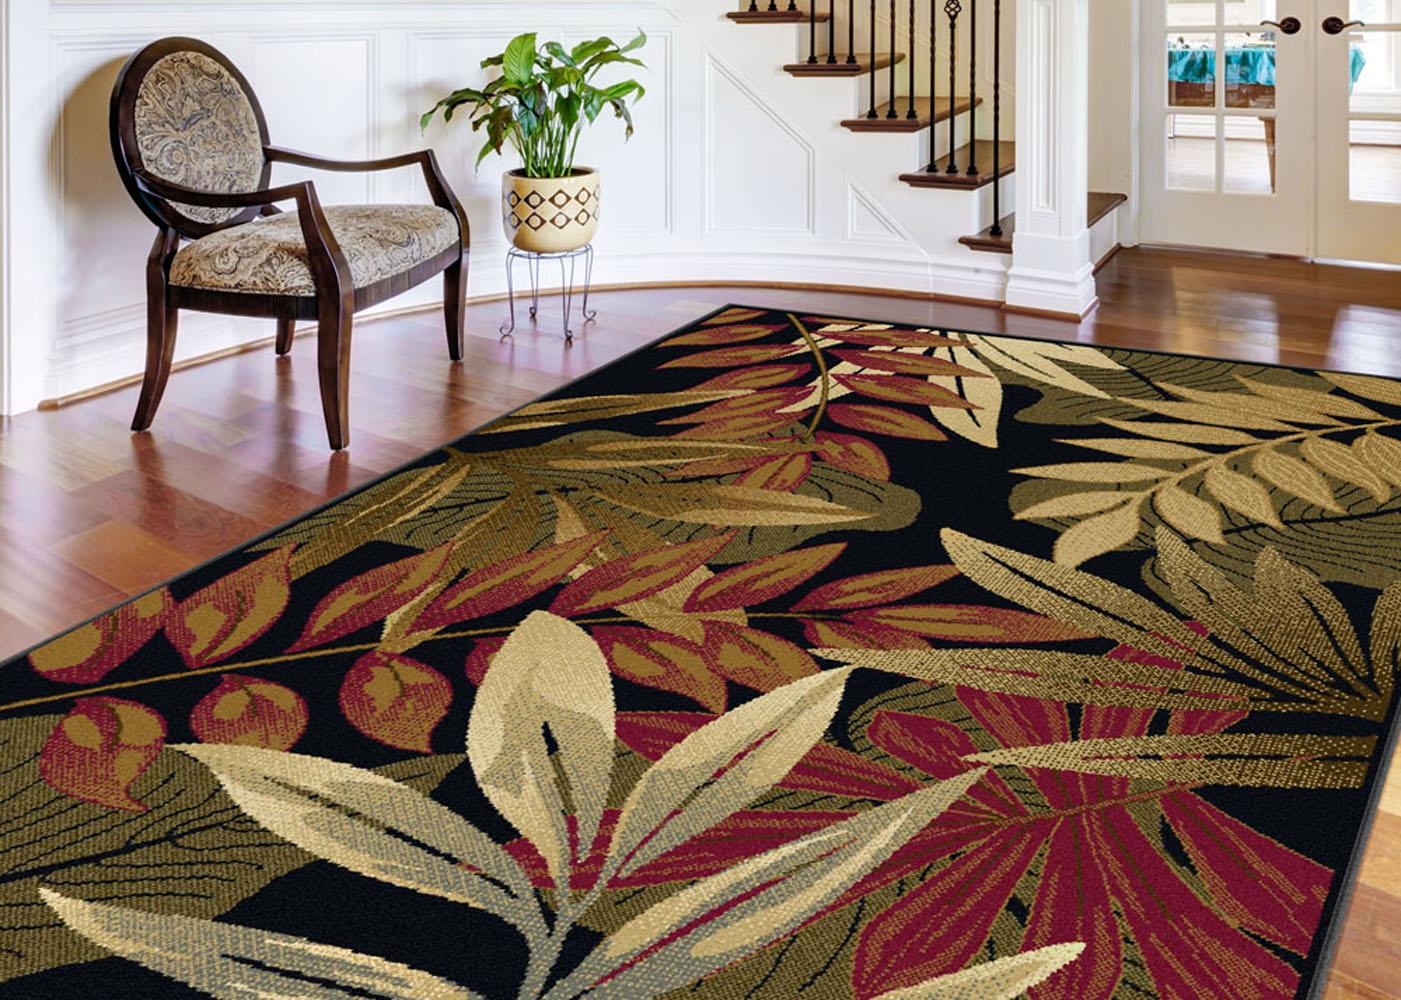 Black Transitional Floral Area Rug Tropical Multi Color